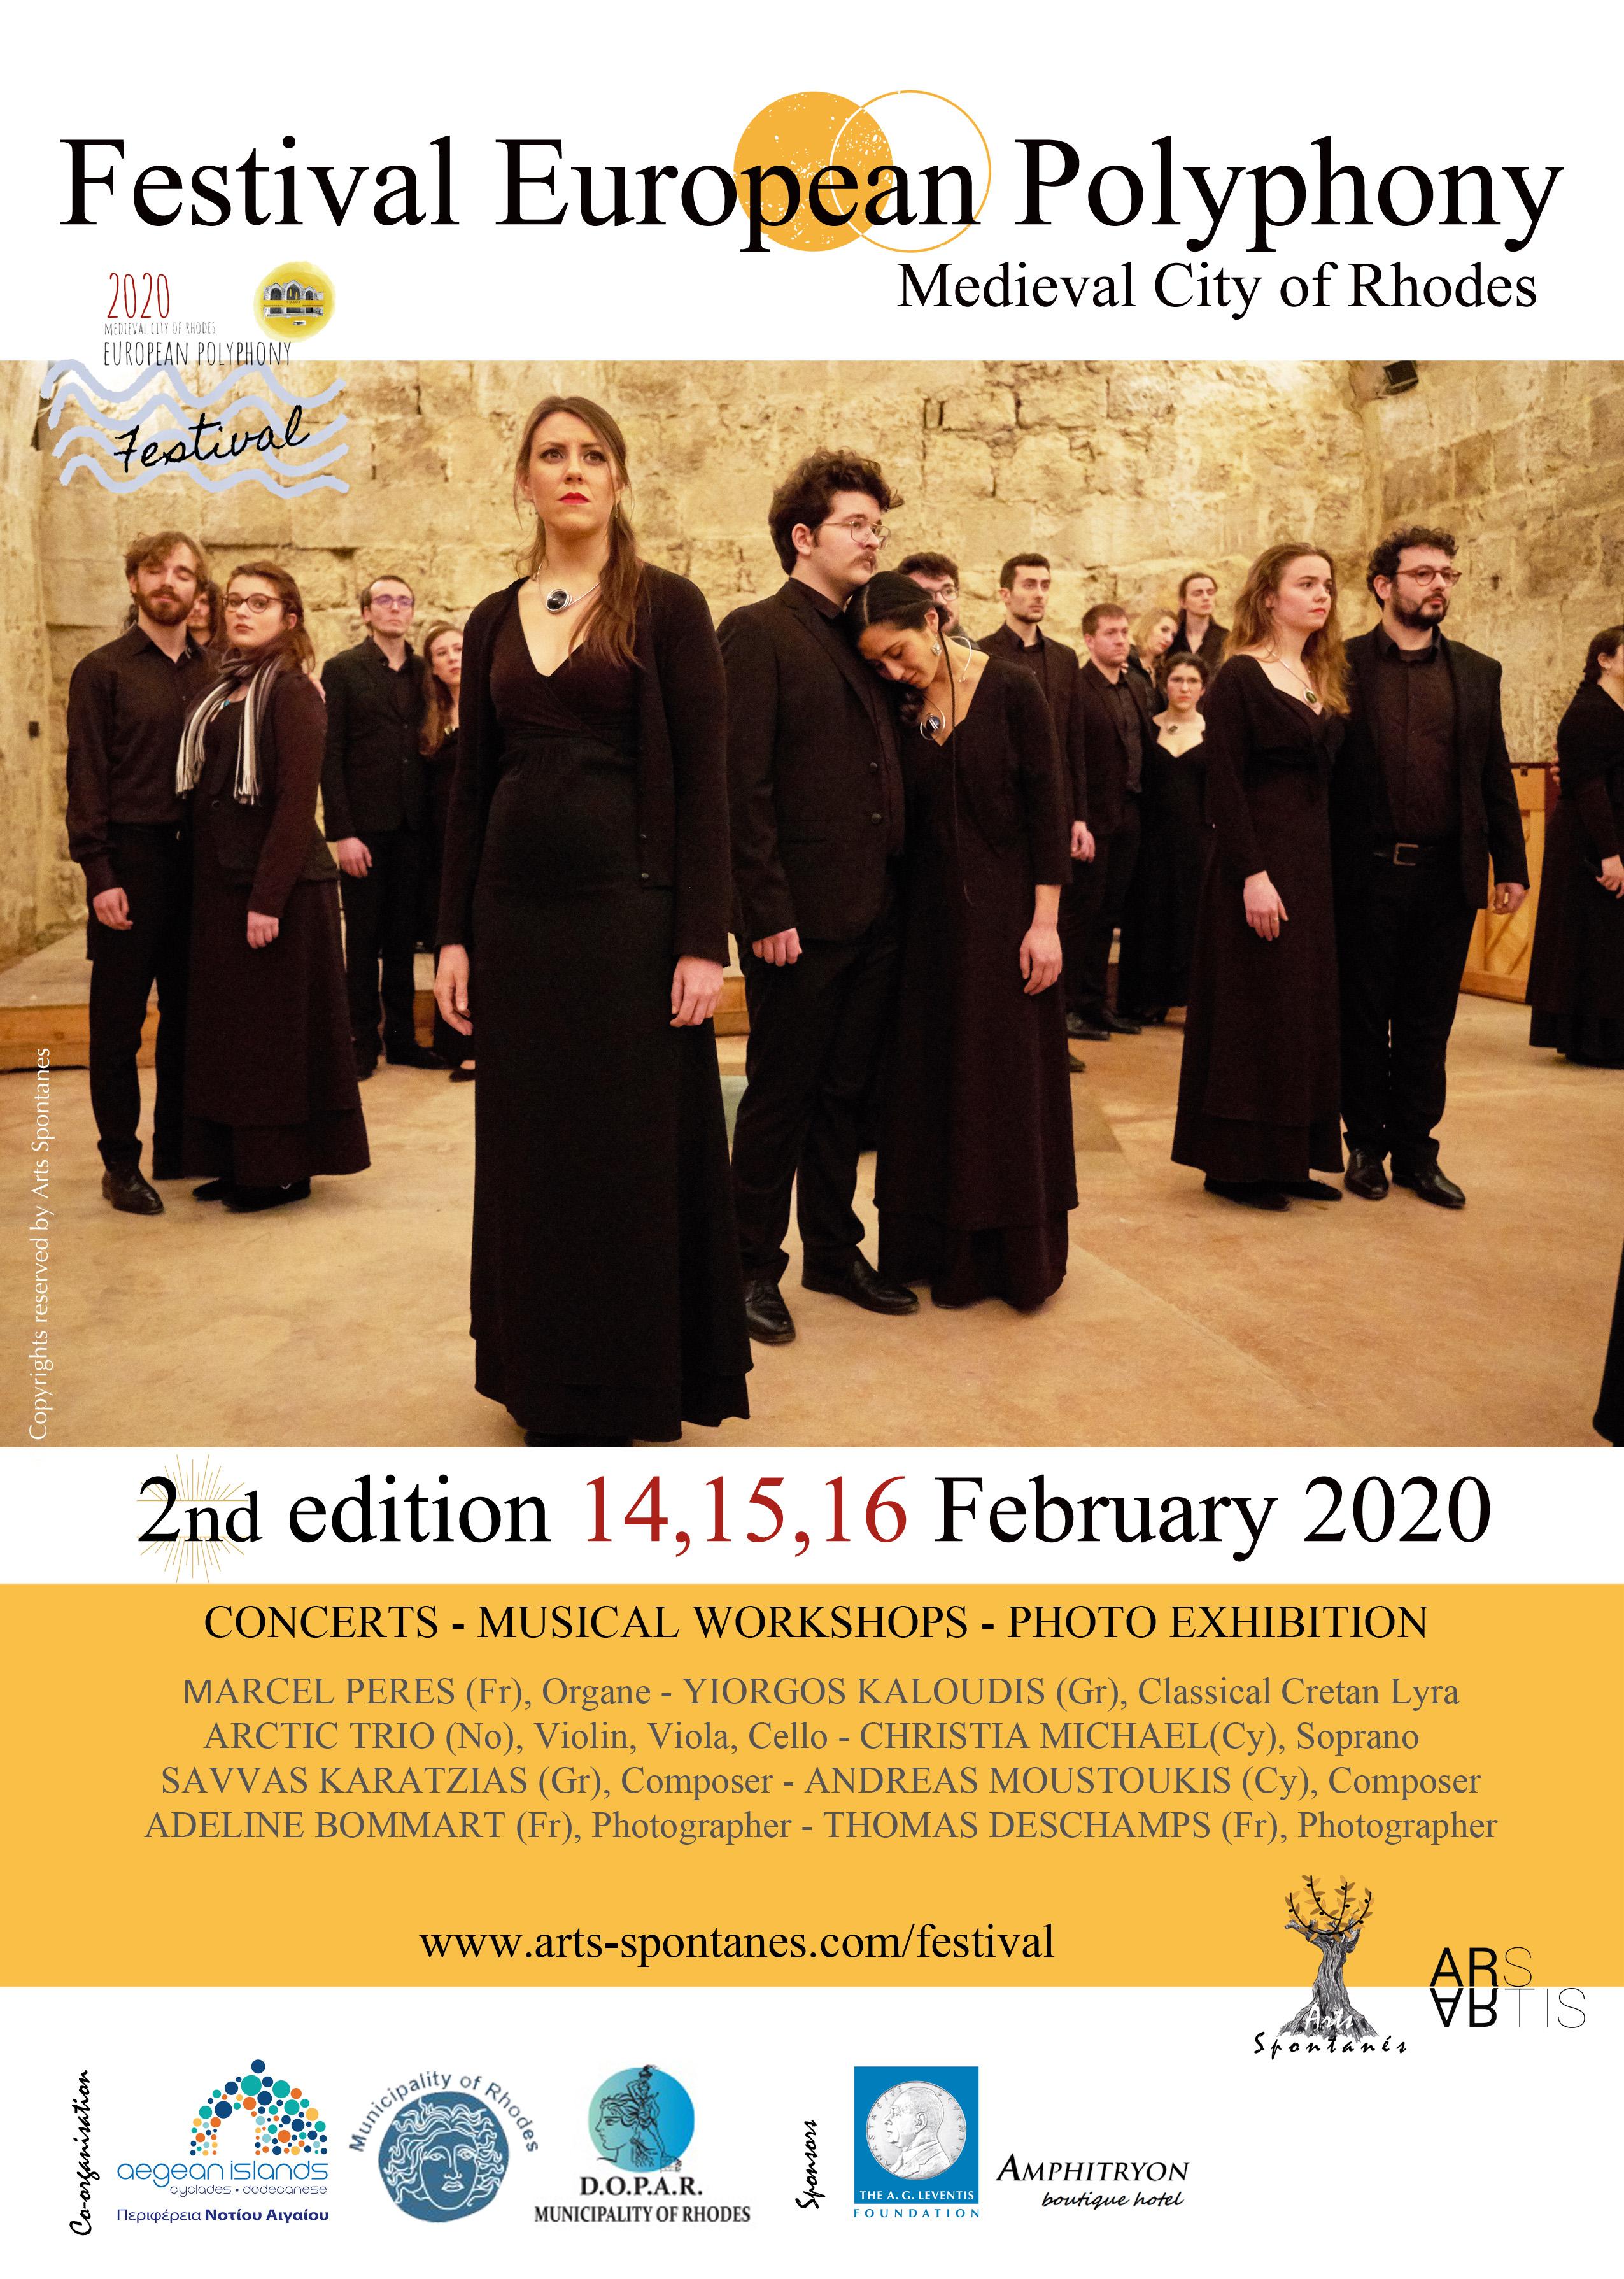 Festival European Polyphonty